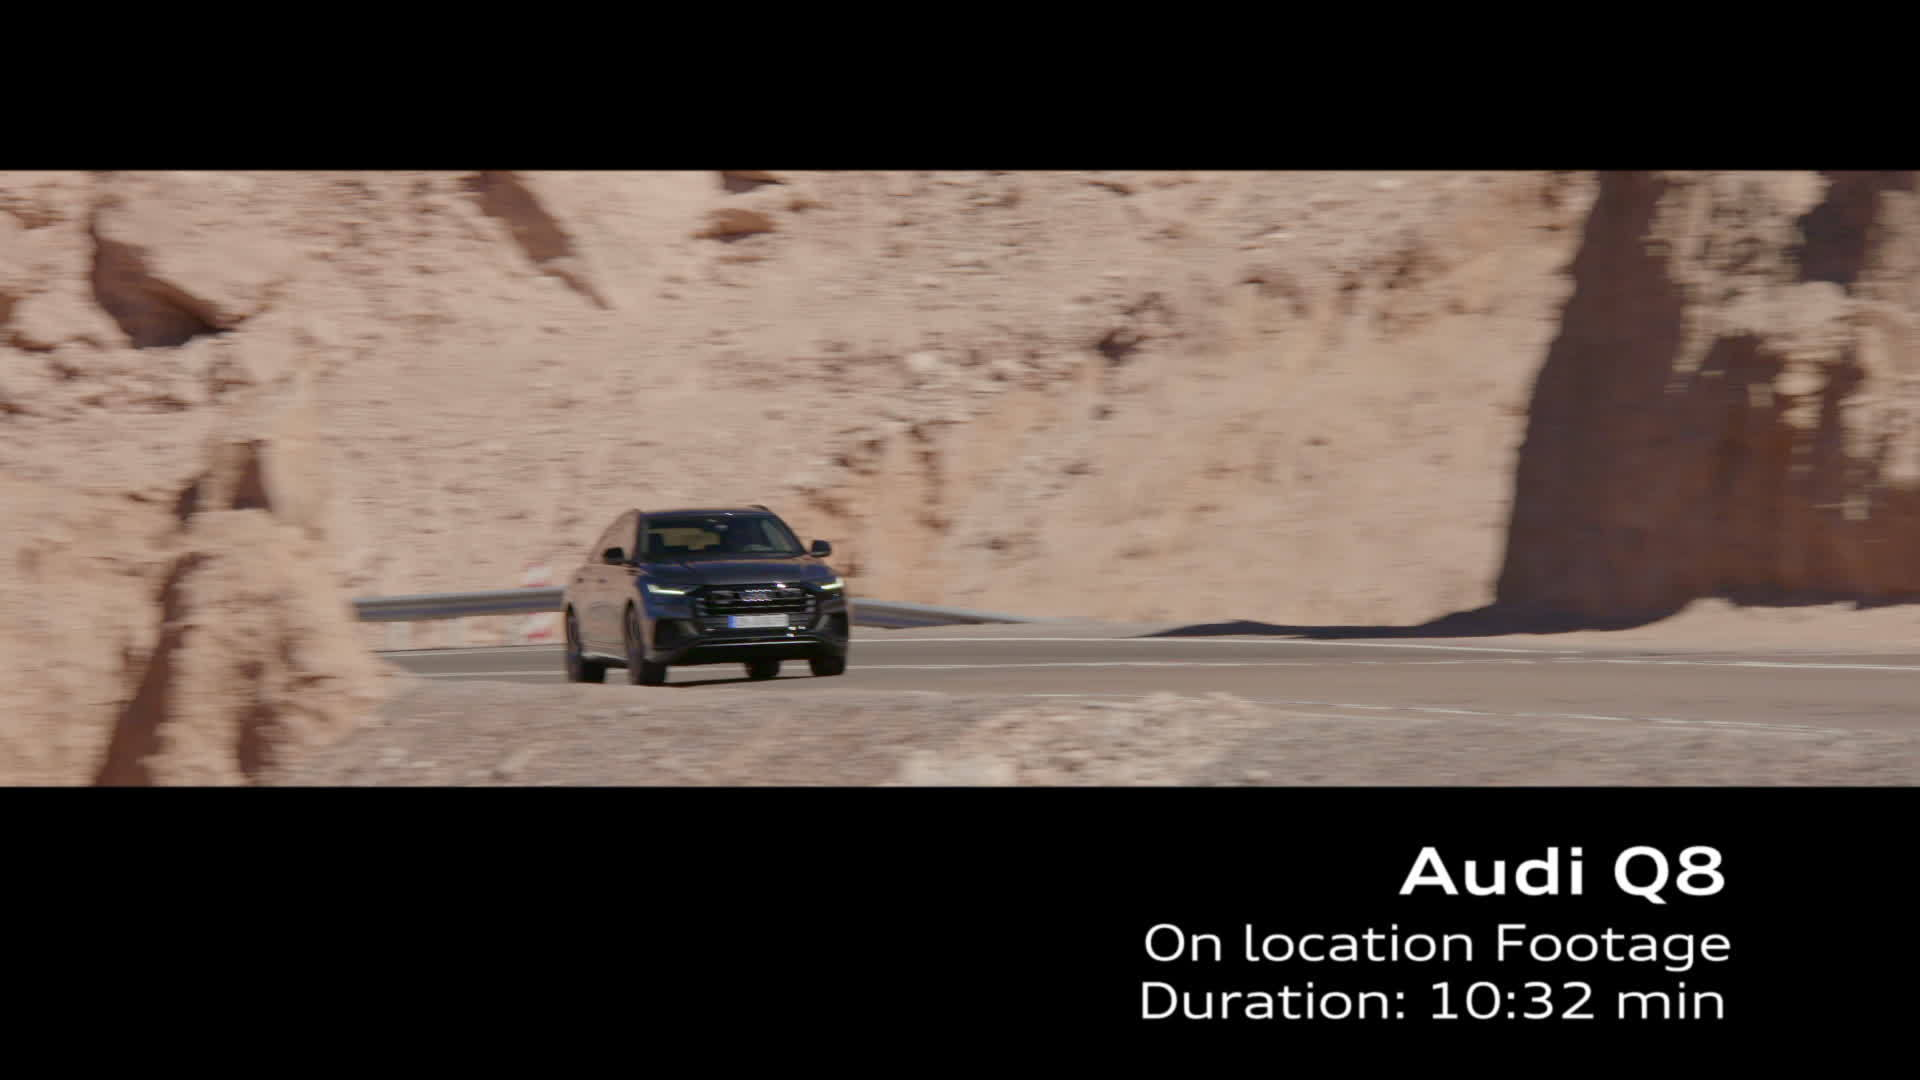 Audi Q8 Footage Chile Daytonagrau